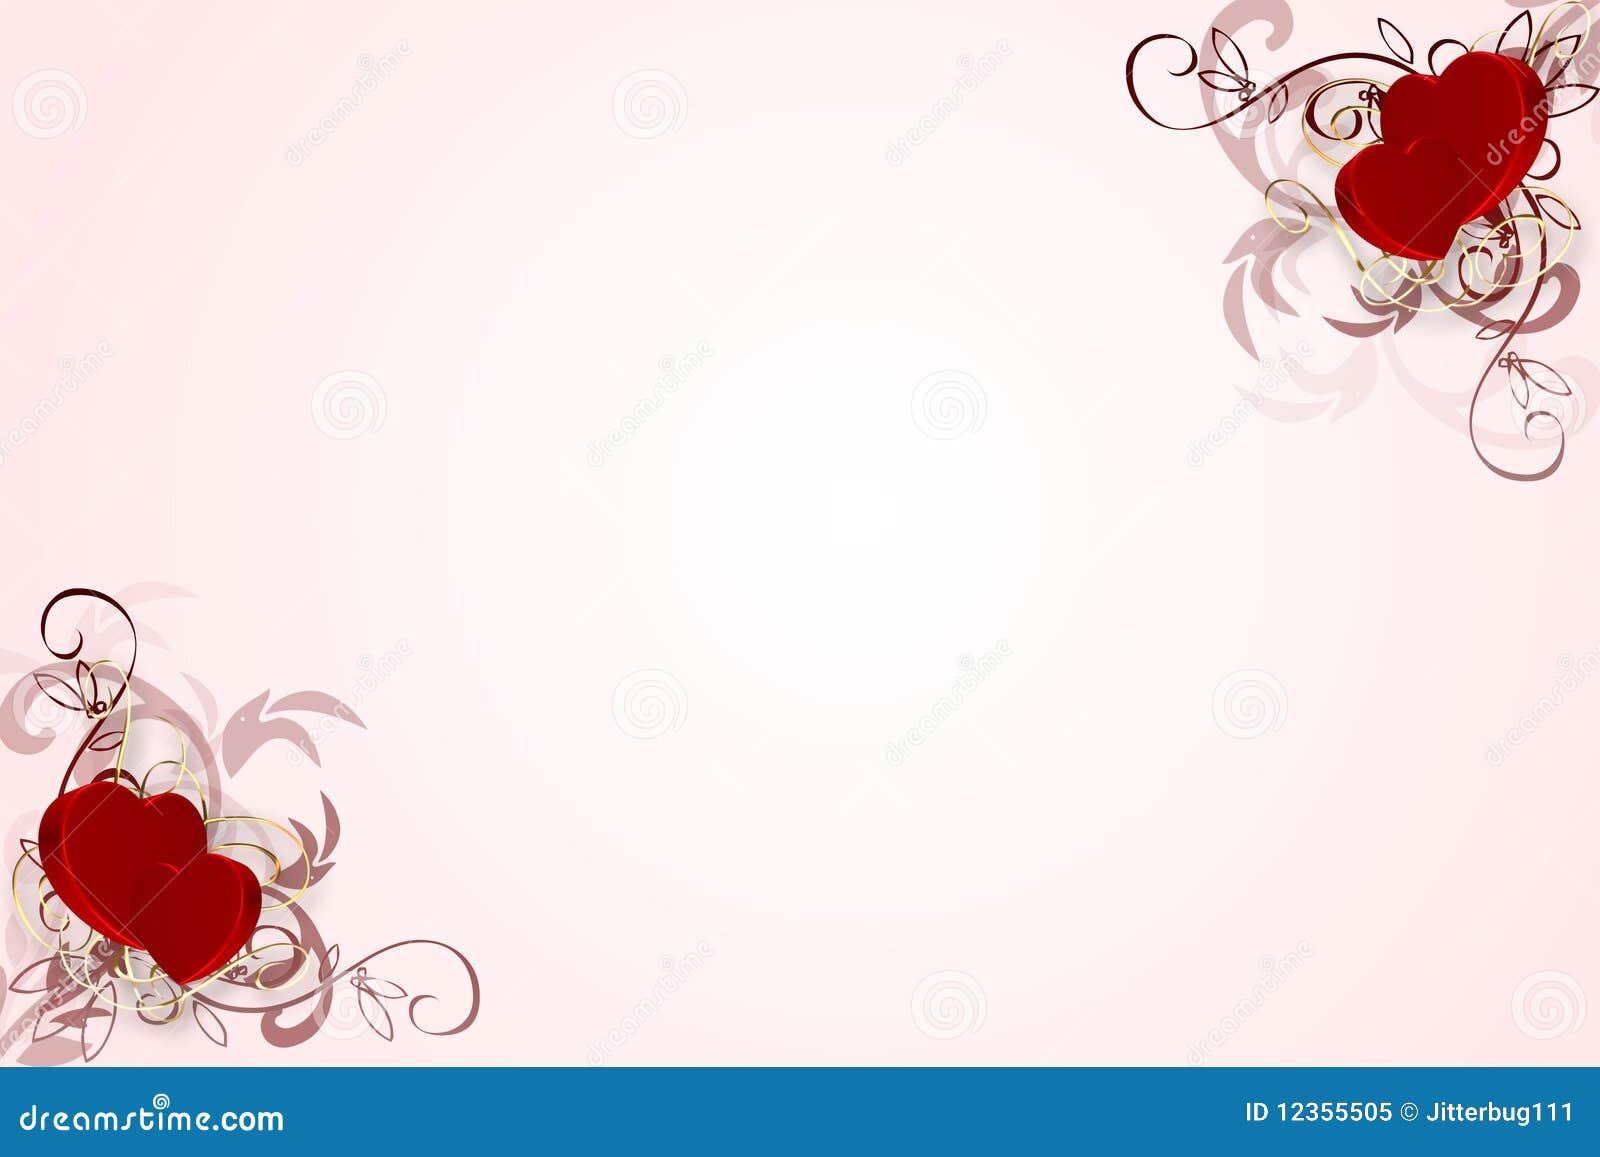 ppt 背景 背景图片 壁纸 边框 模板 设计 相框 1300_957图片